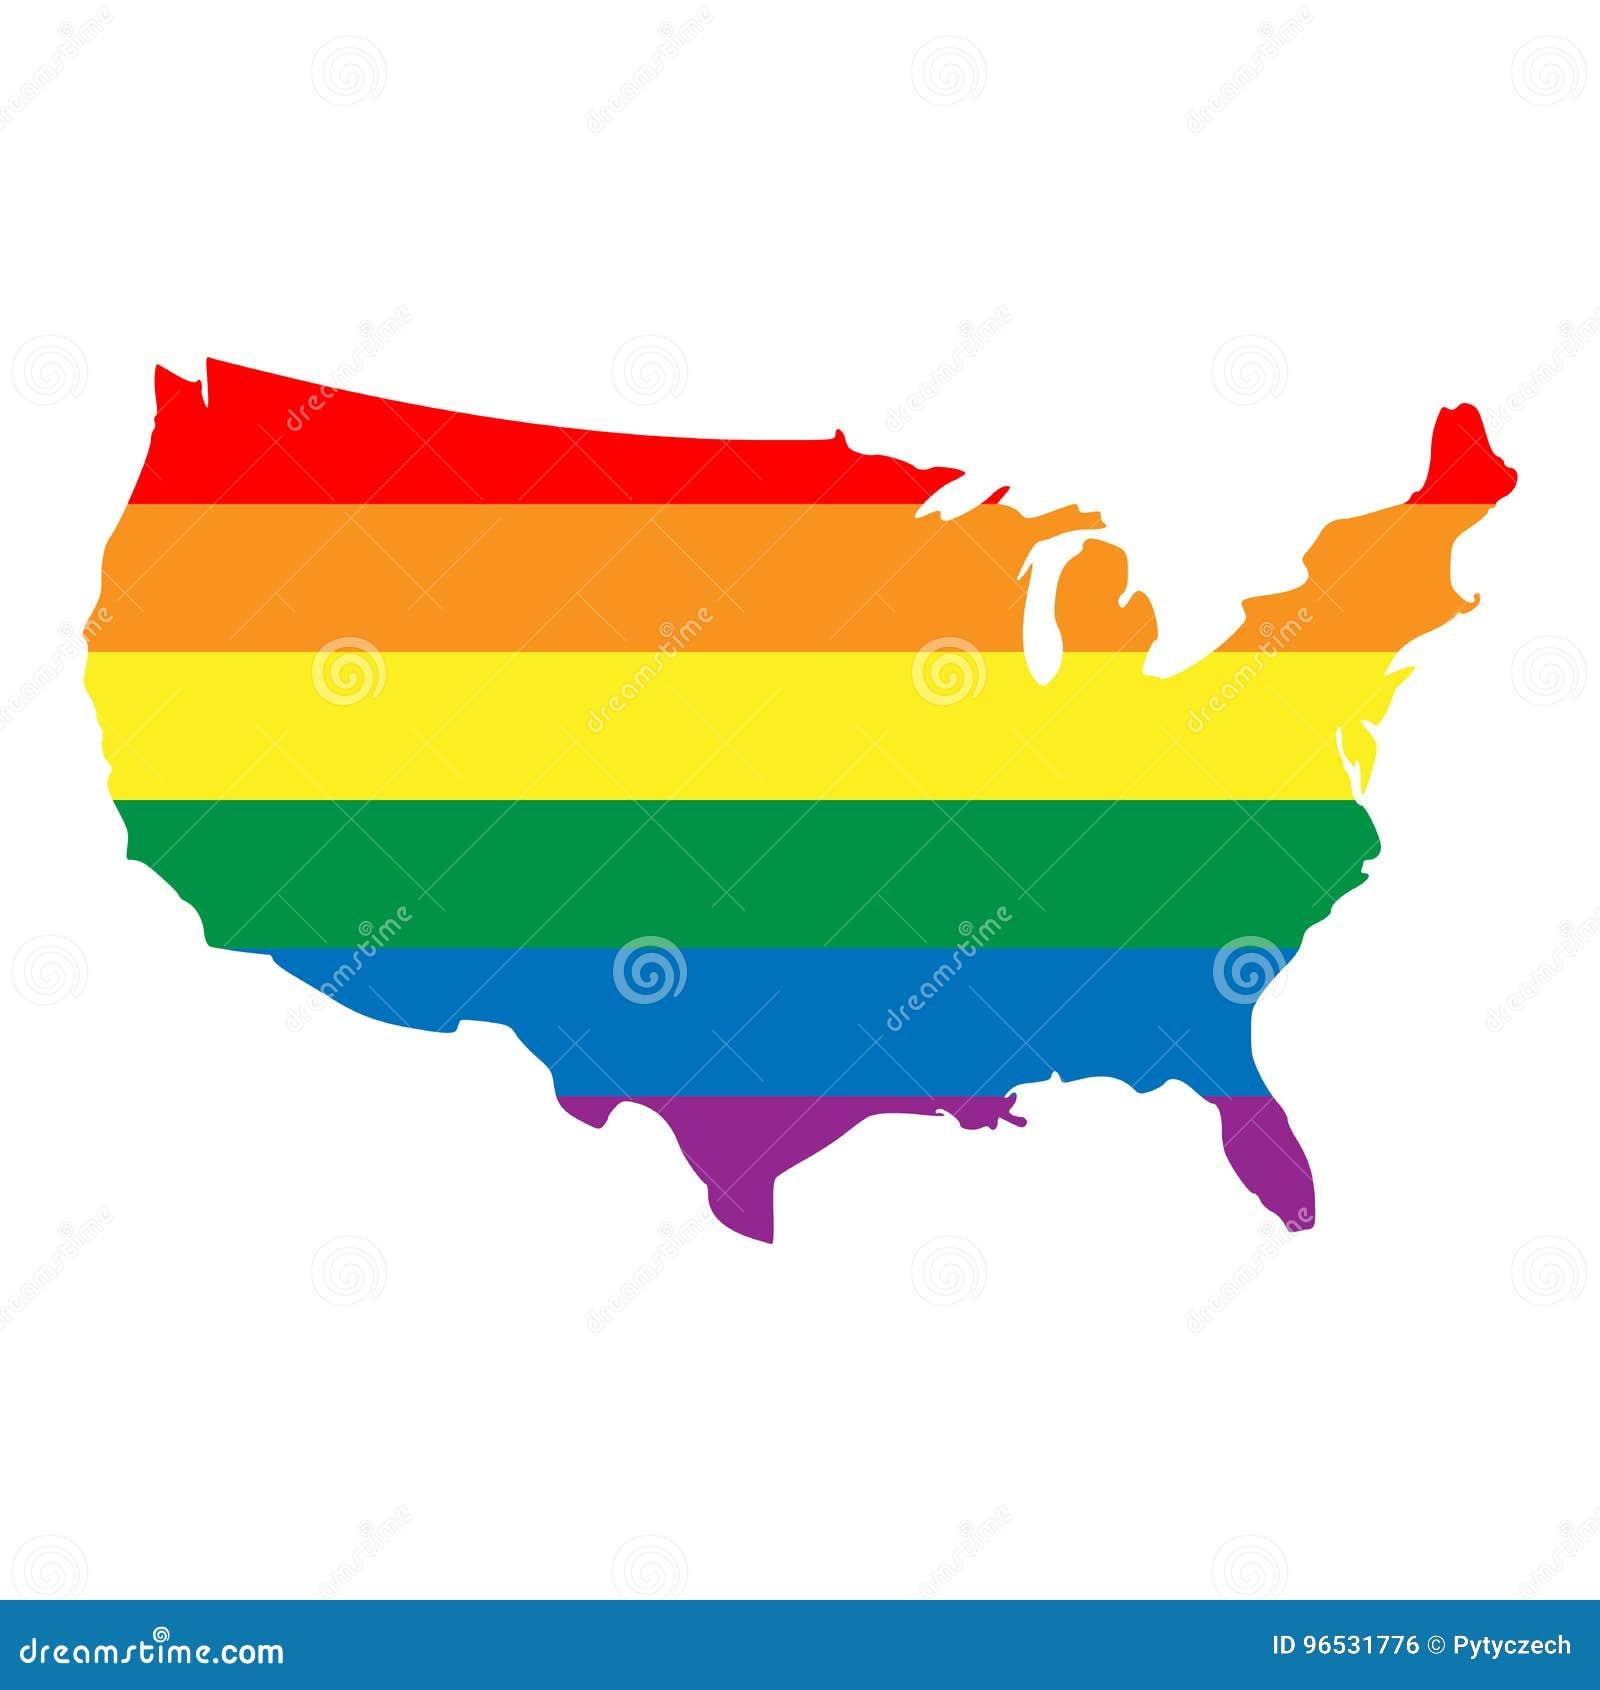 Lesbian gay bisexual transgender discrimination